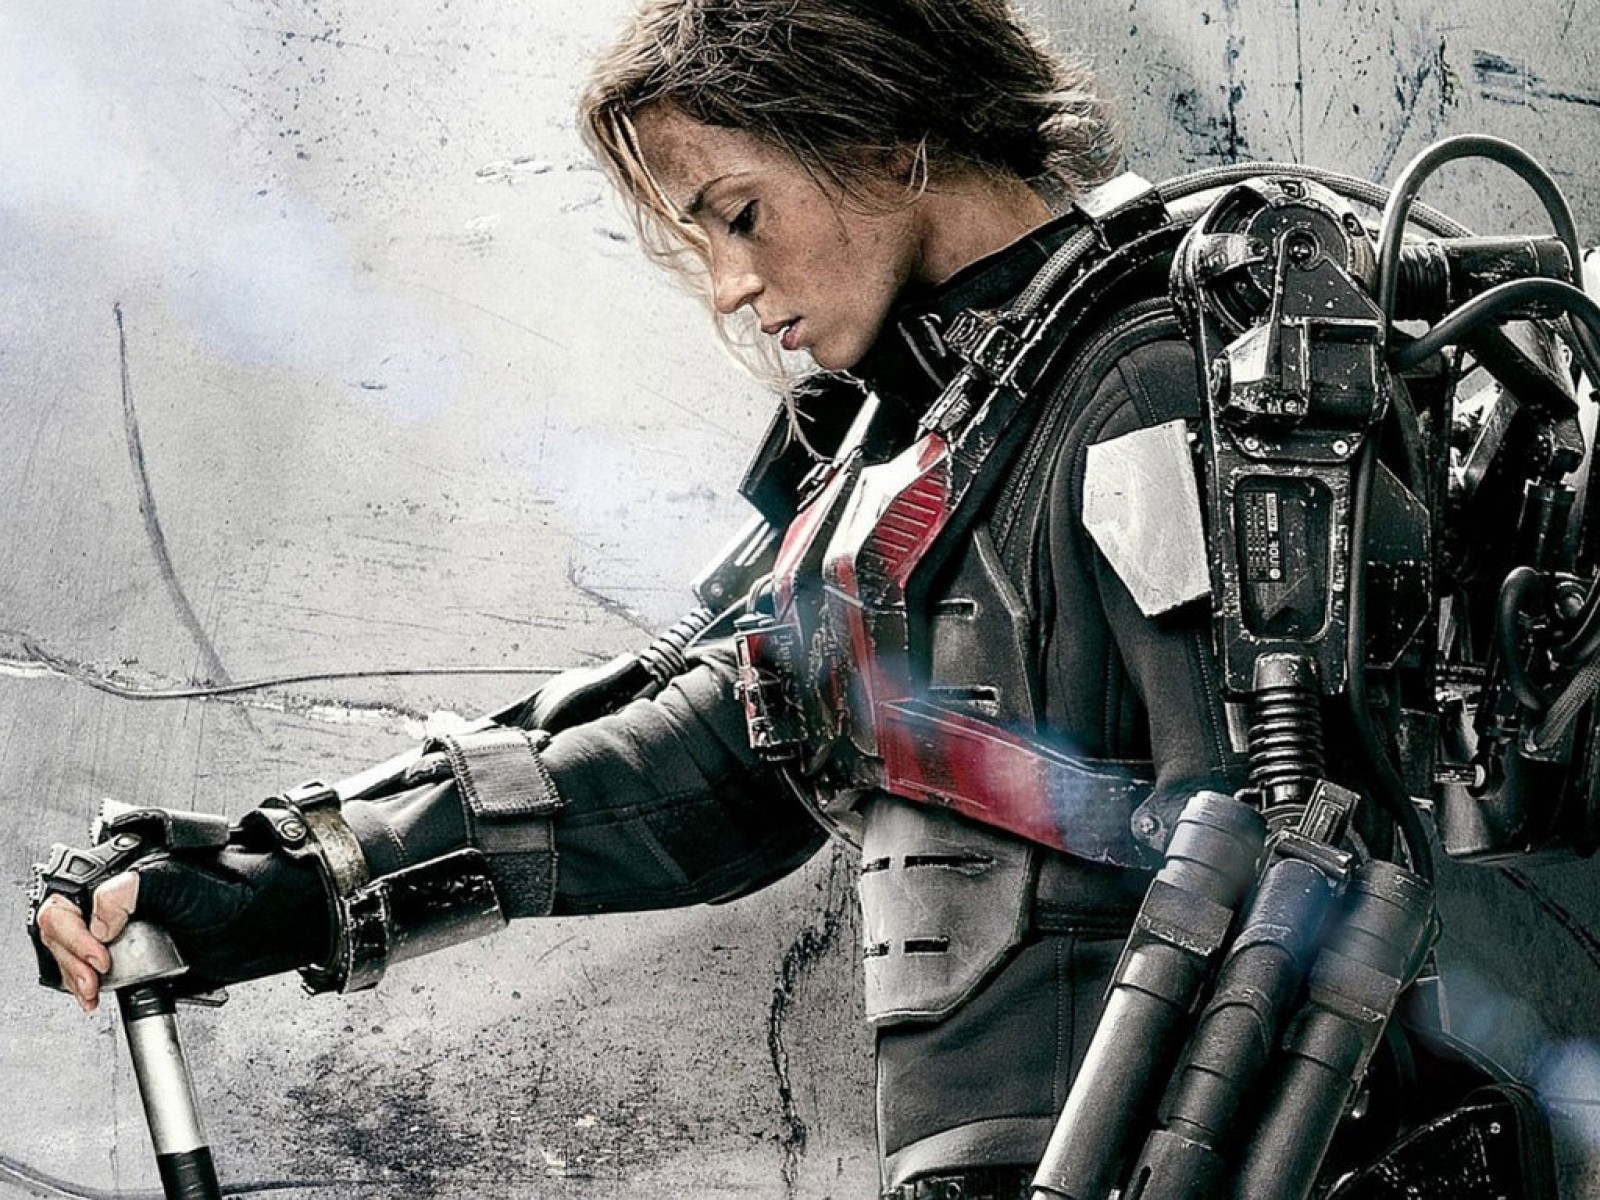 edge-of-tomorrow-movie-hd-wallpaper.jpg